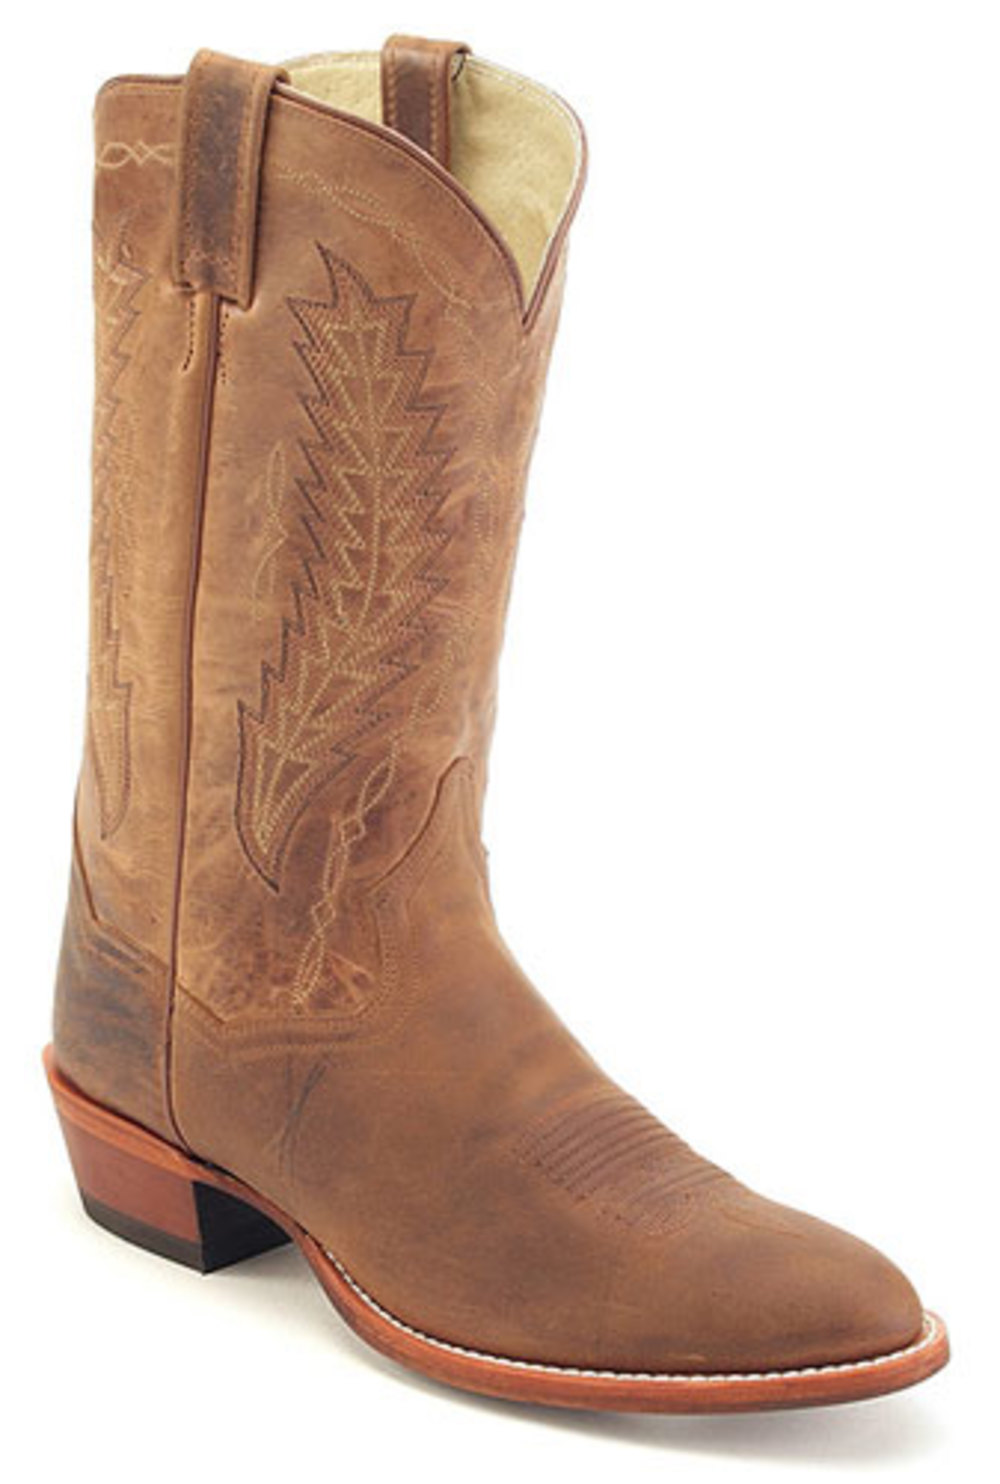 Men's Dan Post JOSH Pull On Cowboy Boots TAN 11.5 D